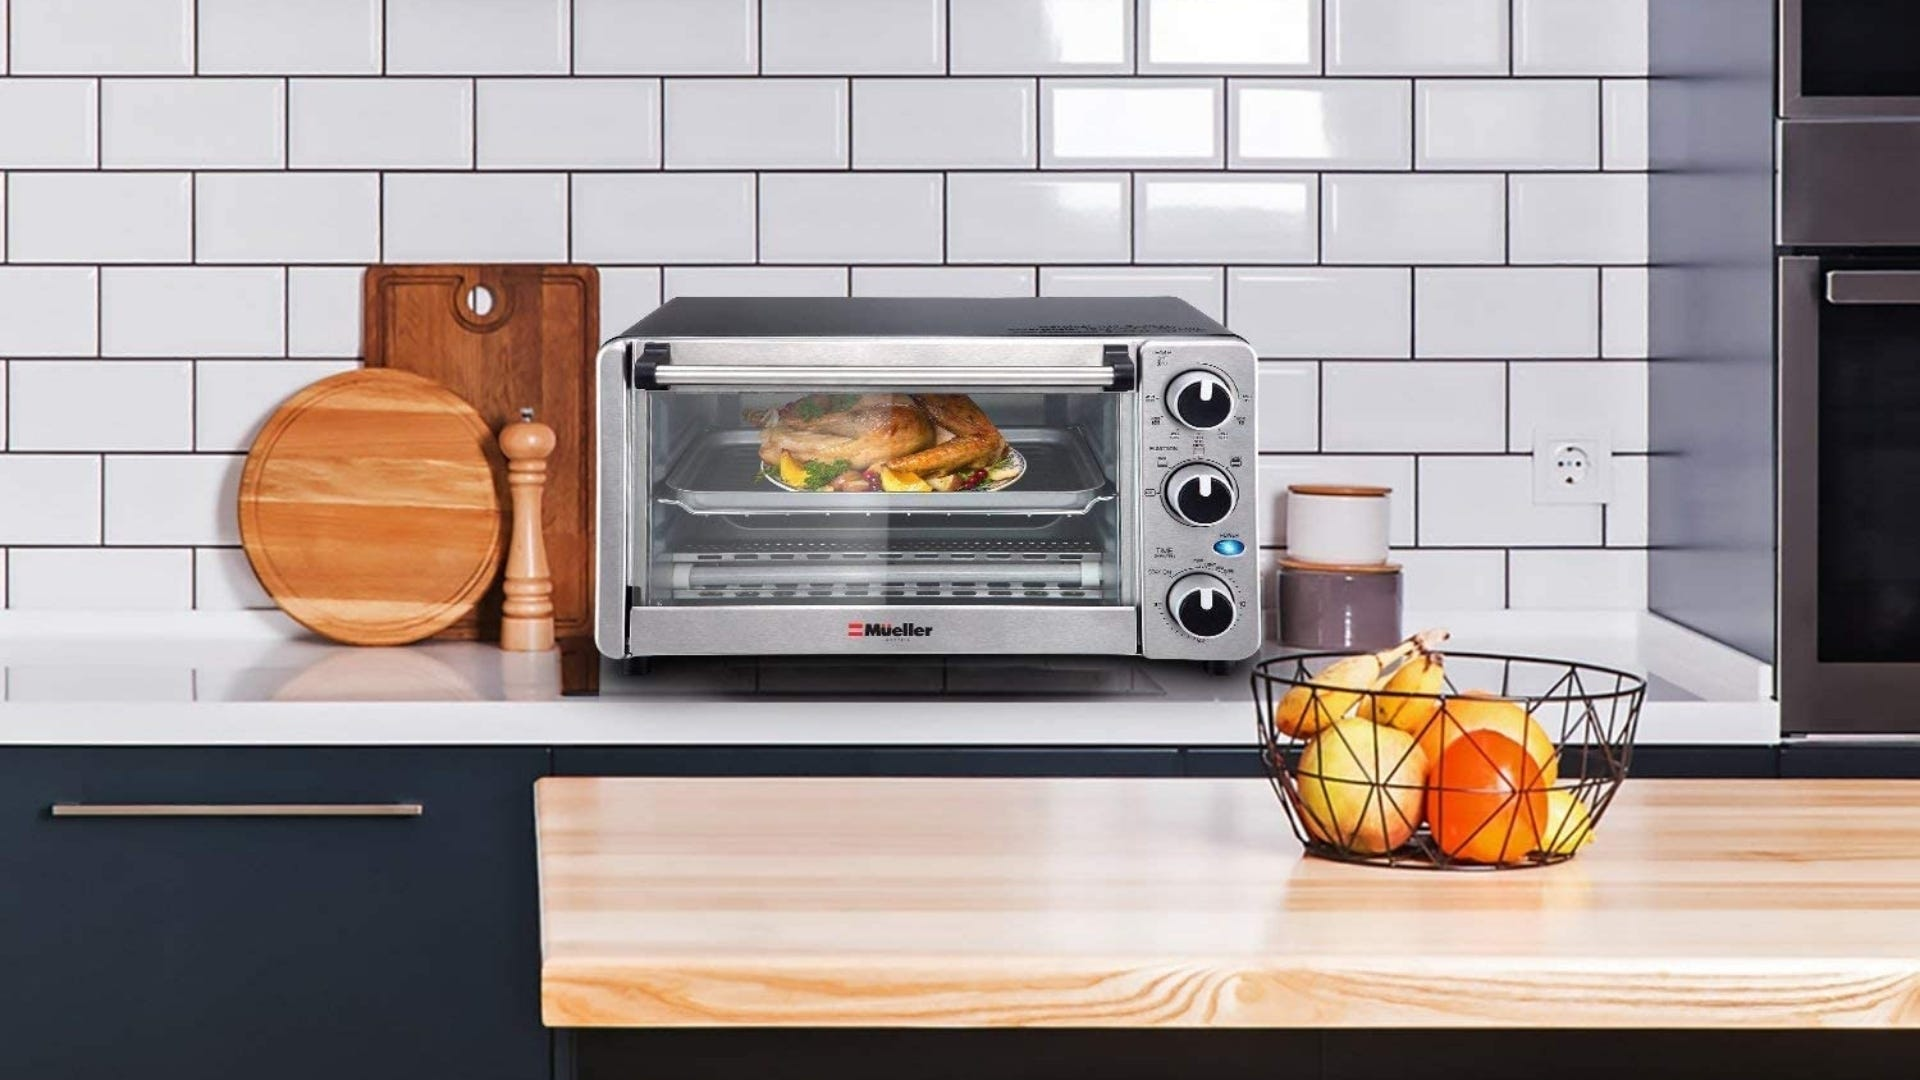 Toaster oven sitting on kitchen countertop